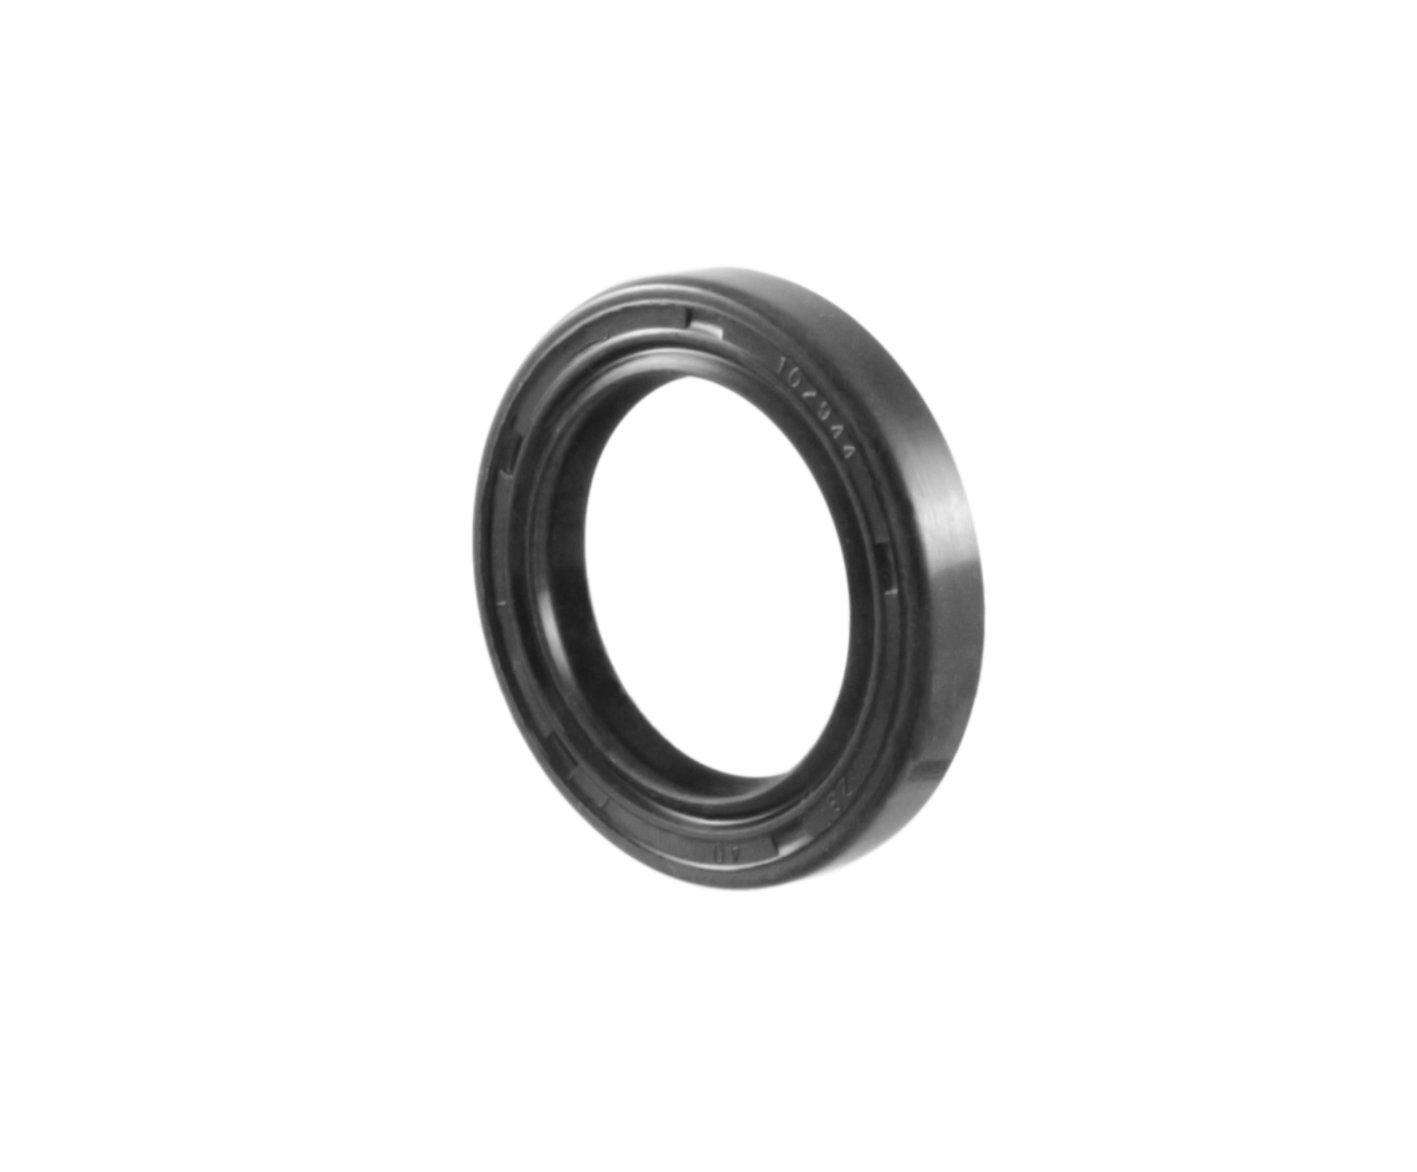 Oil Seal 28X40X7 (10 PCS) Oil Seal Grease Seal TC |EAI Rubber Double Lip w/Garter Spring 28mmX40mmX7mm | 1.102''x1.575''x0.276''